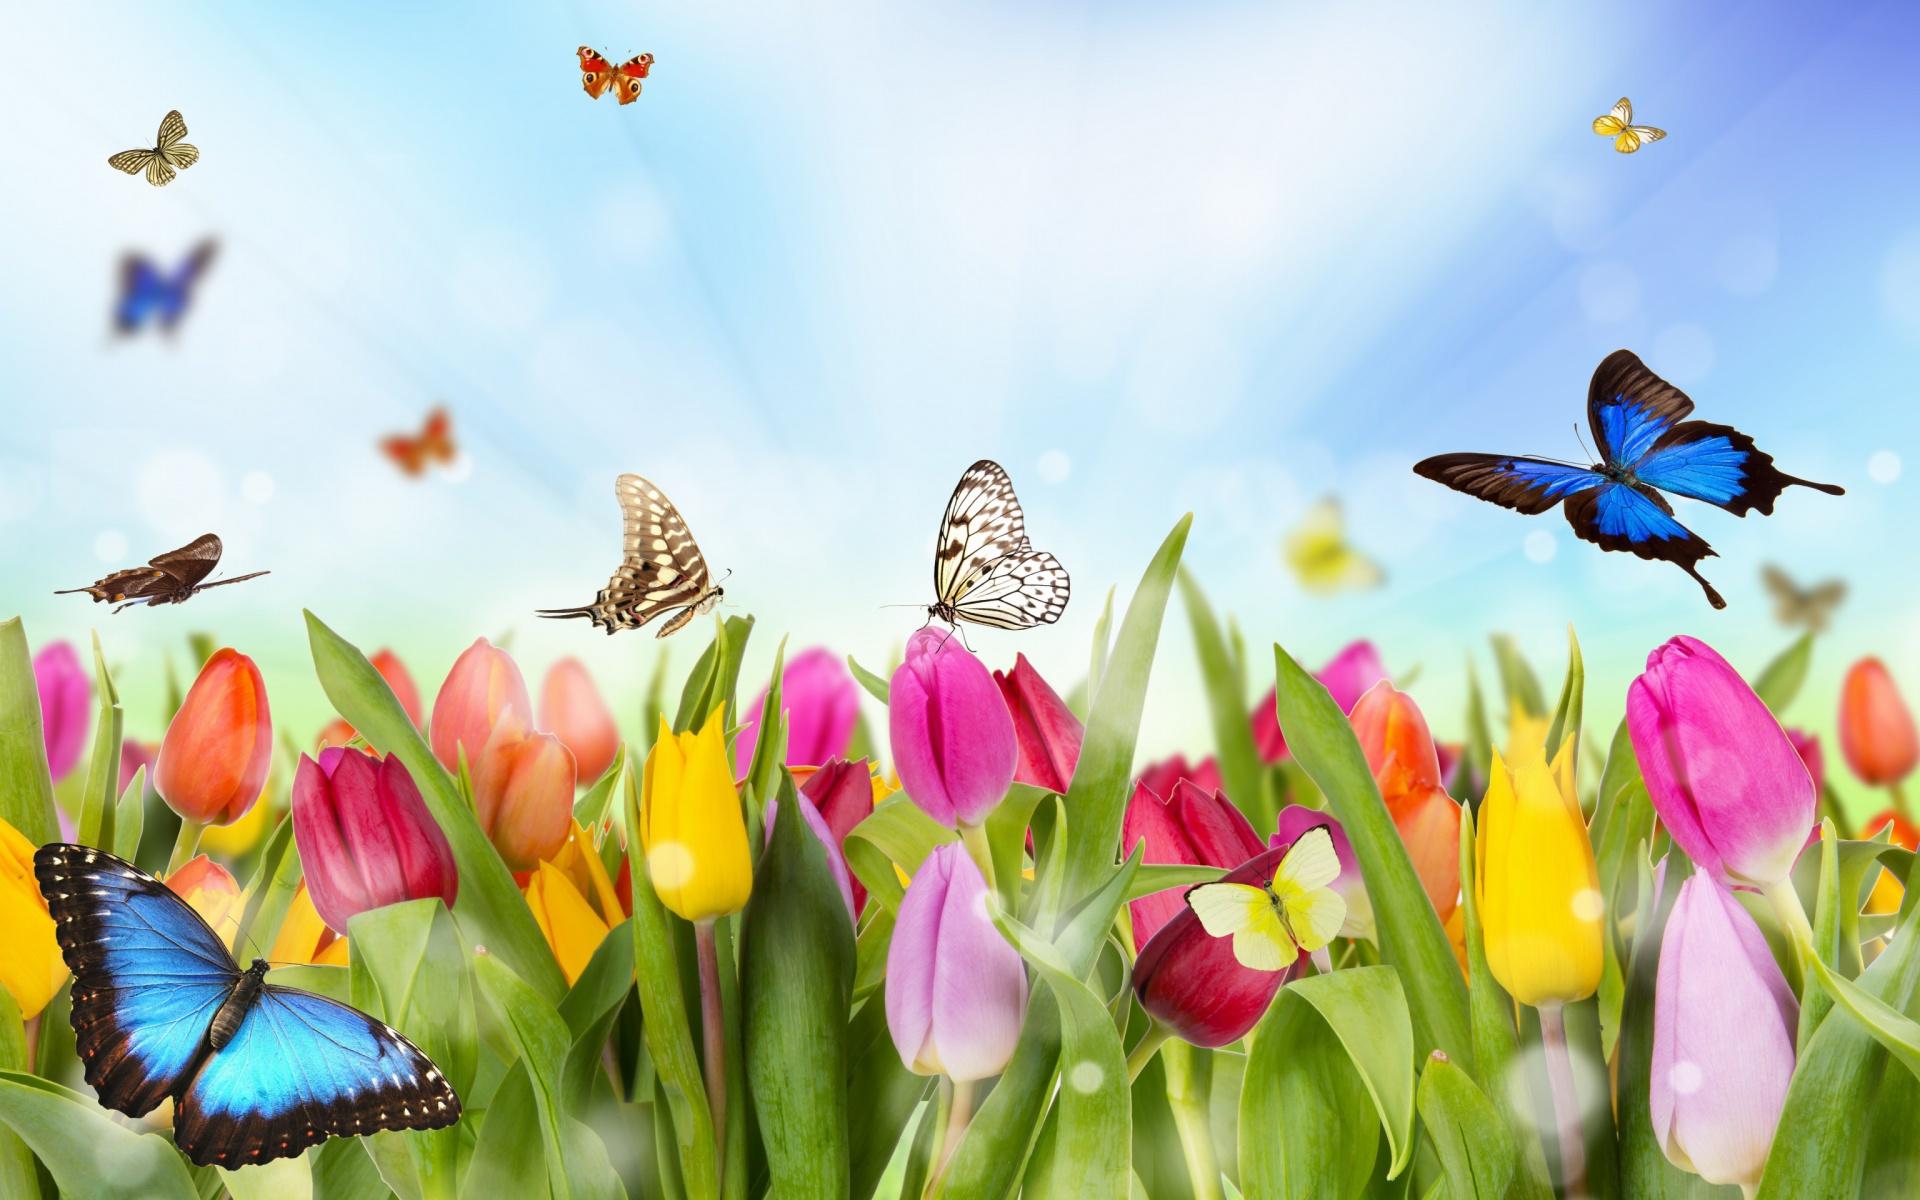 Butterflies and tulip field fondos de pantalla gratis for Fondos para pc gratis